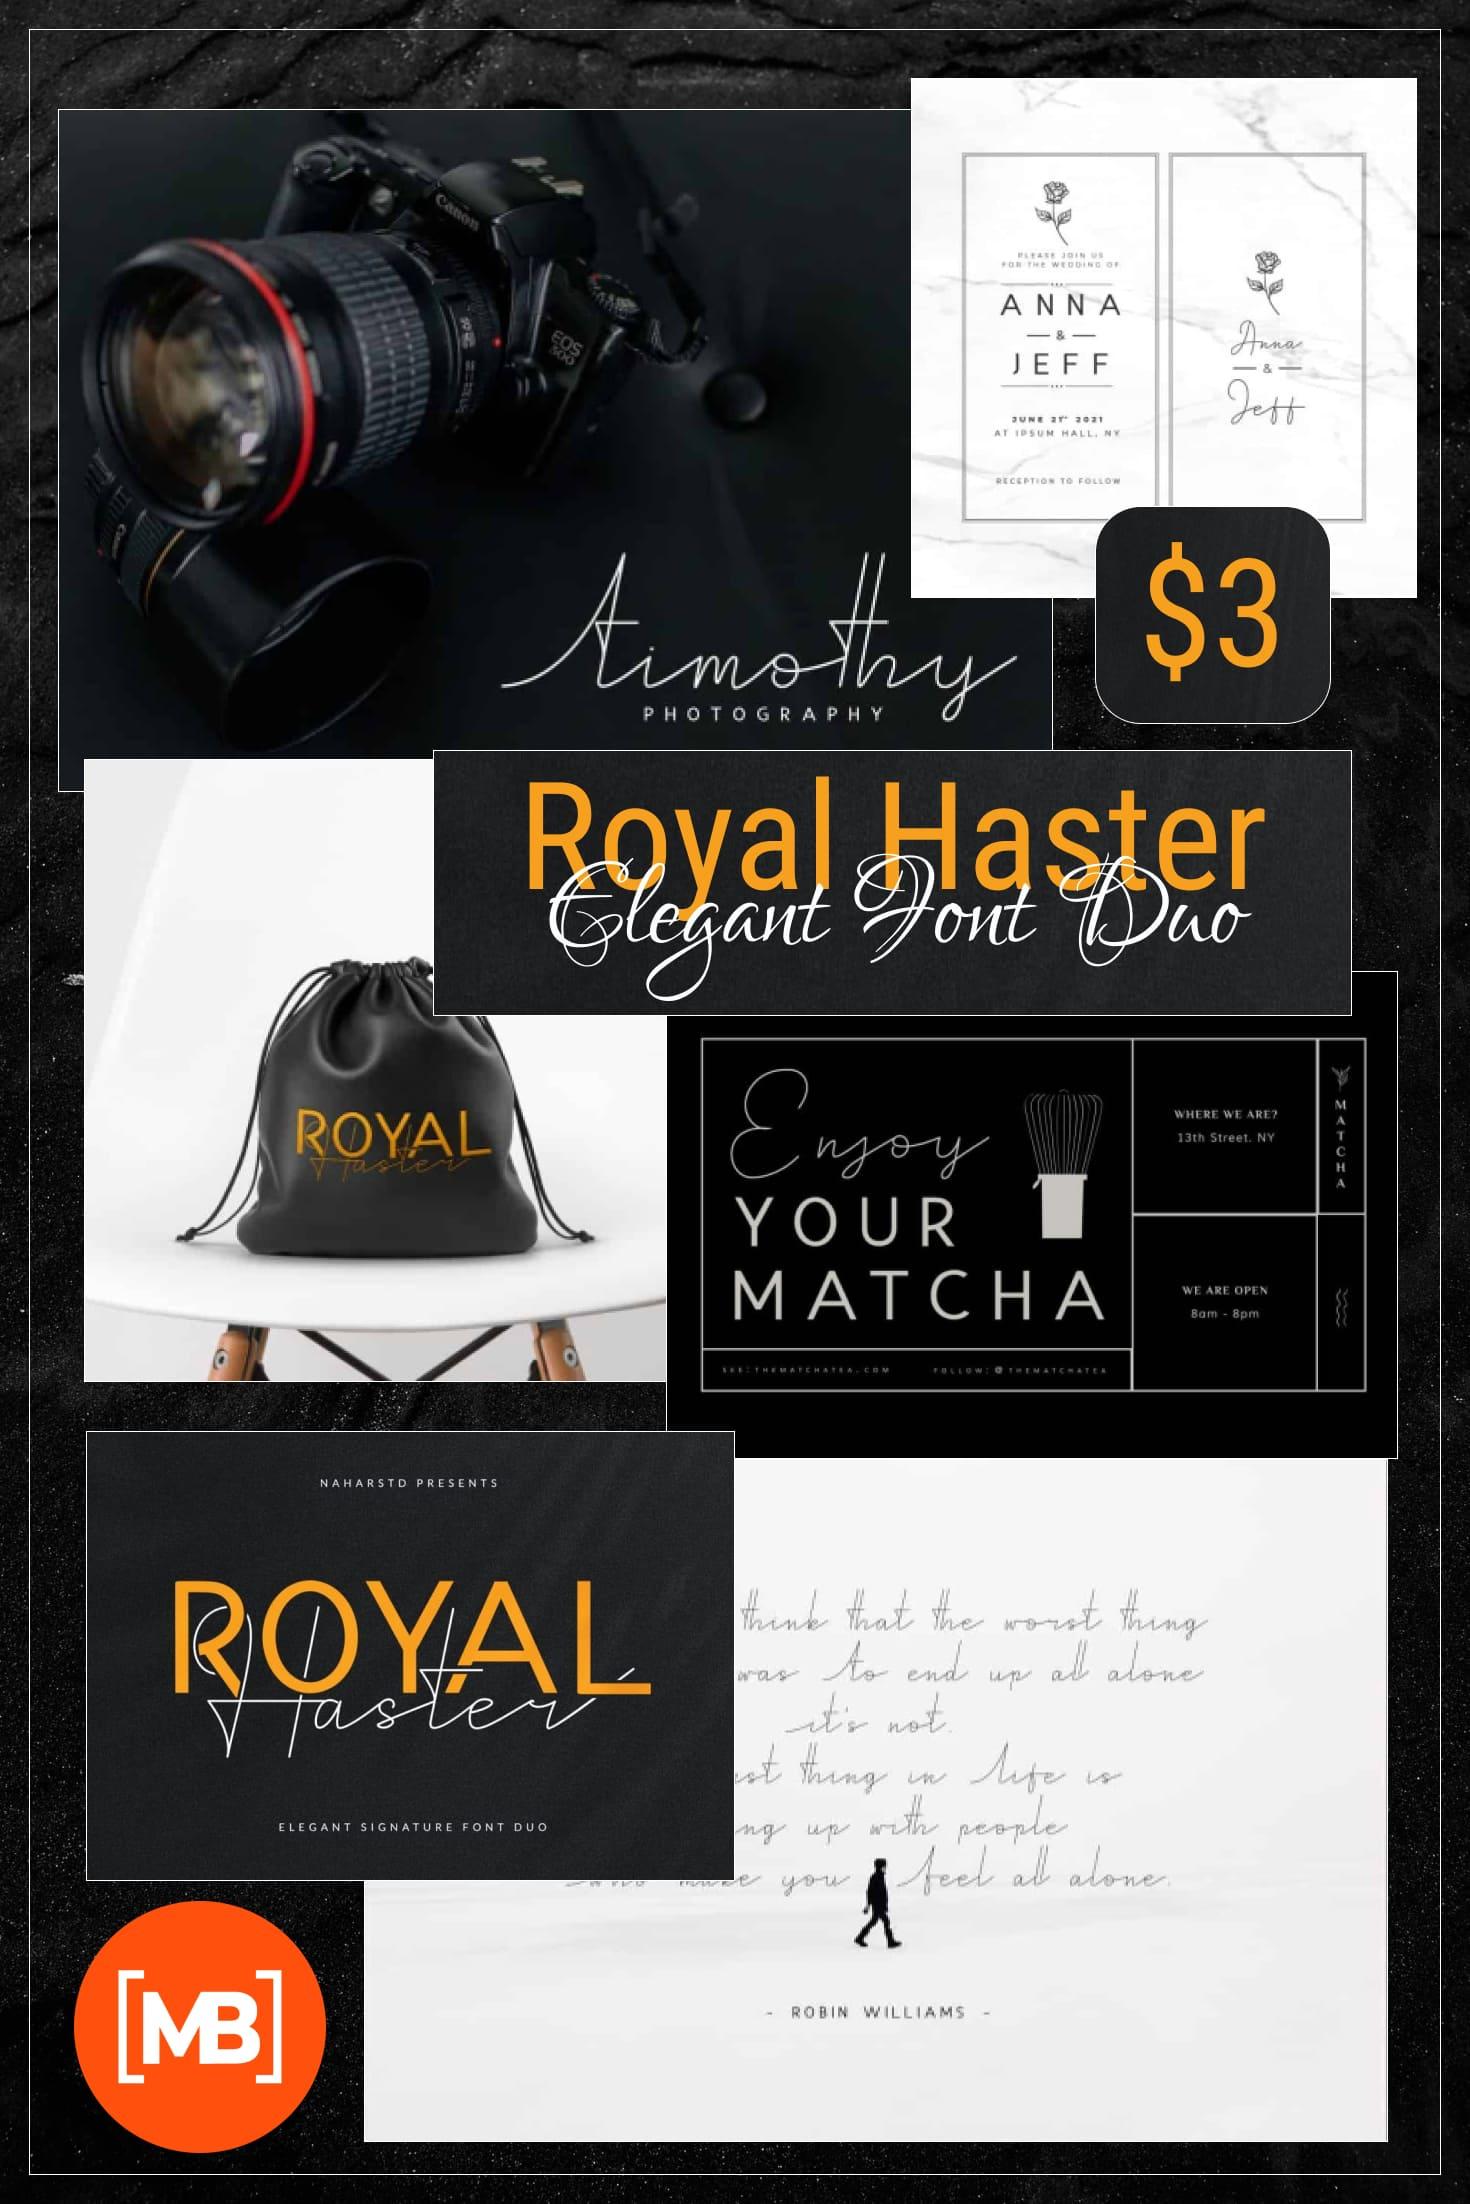 Pinterest Image: Royal Haster - Elegant Font Duo -$3.